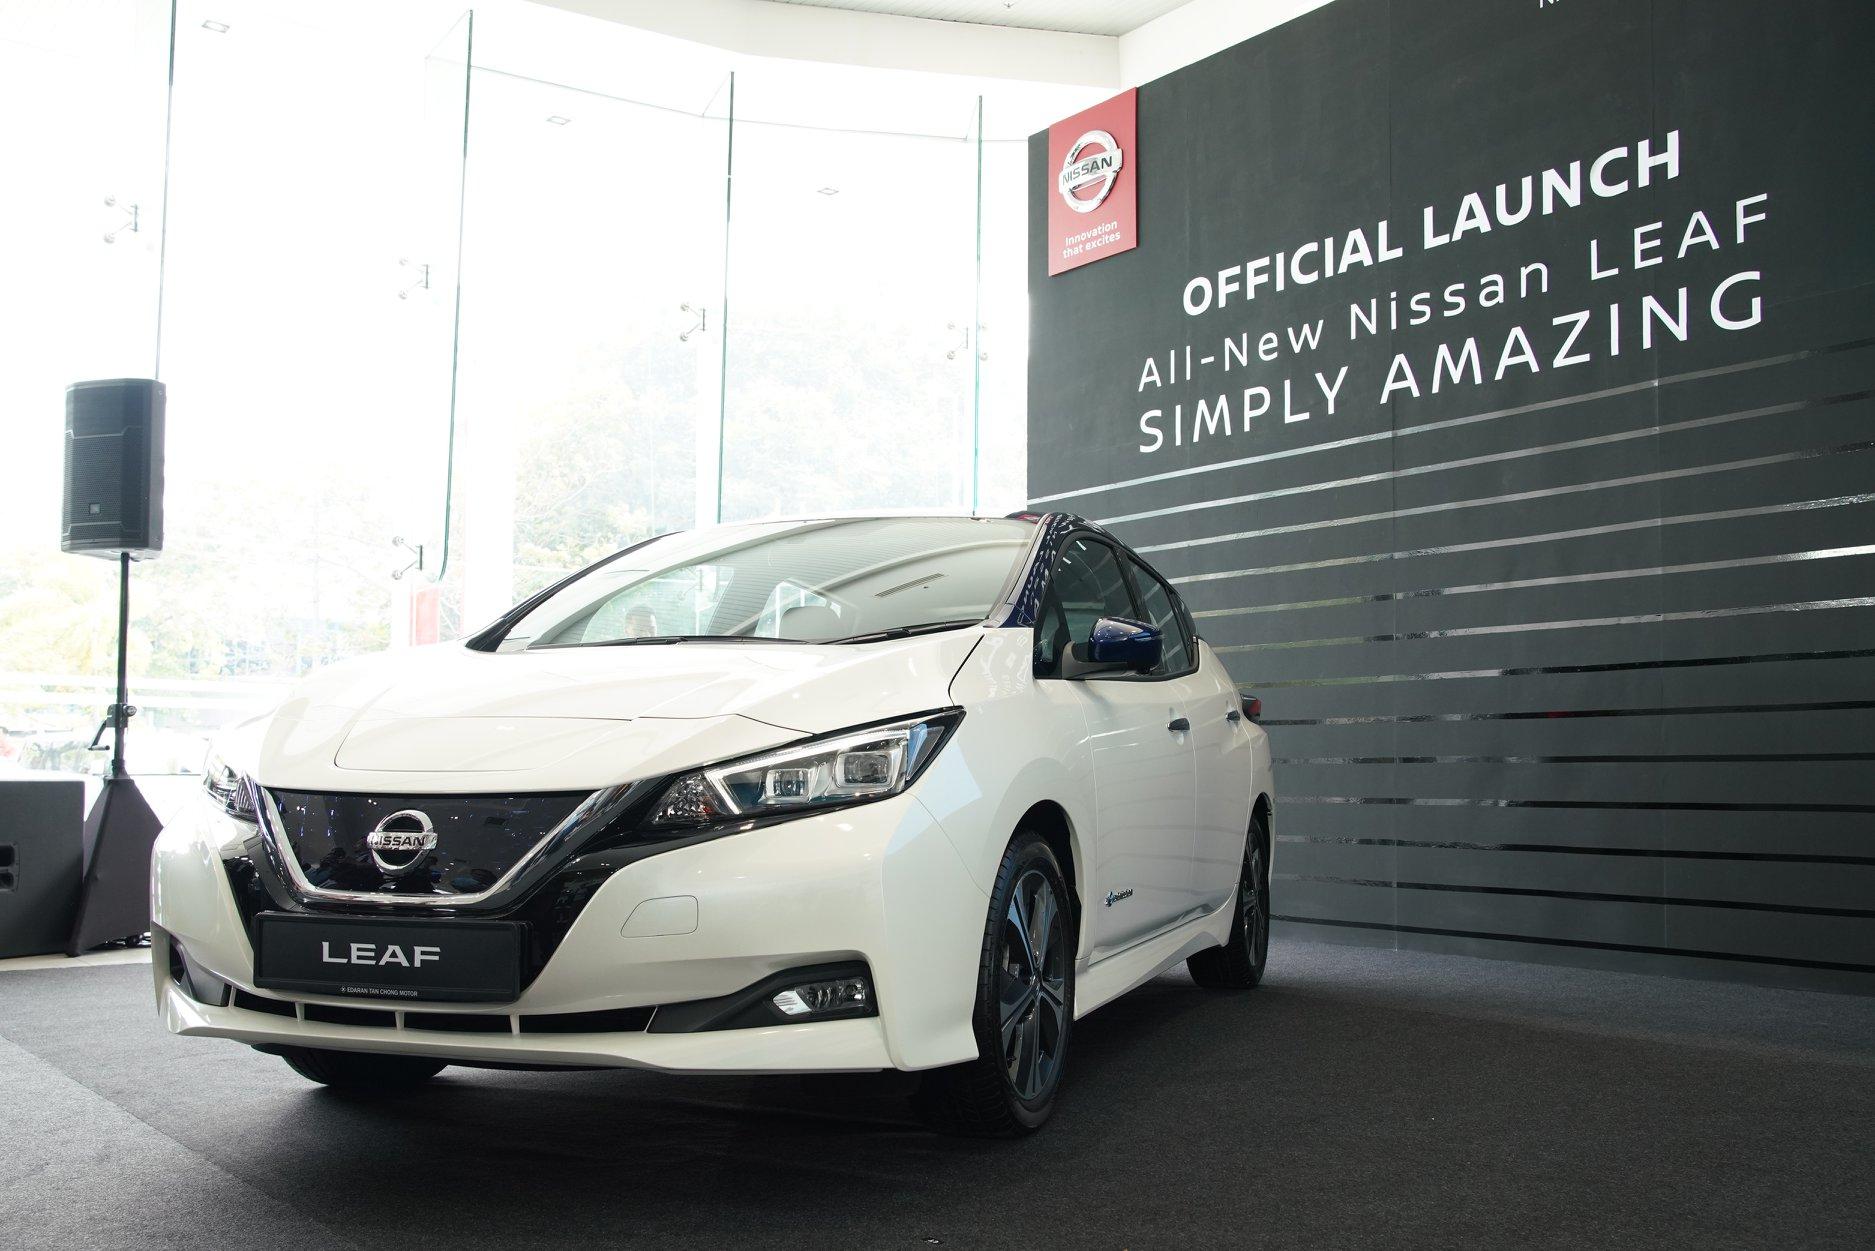 Edaran Tan Chong Motor Launches the Nissan LEAF in Malaysia